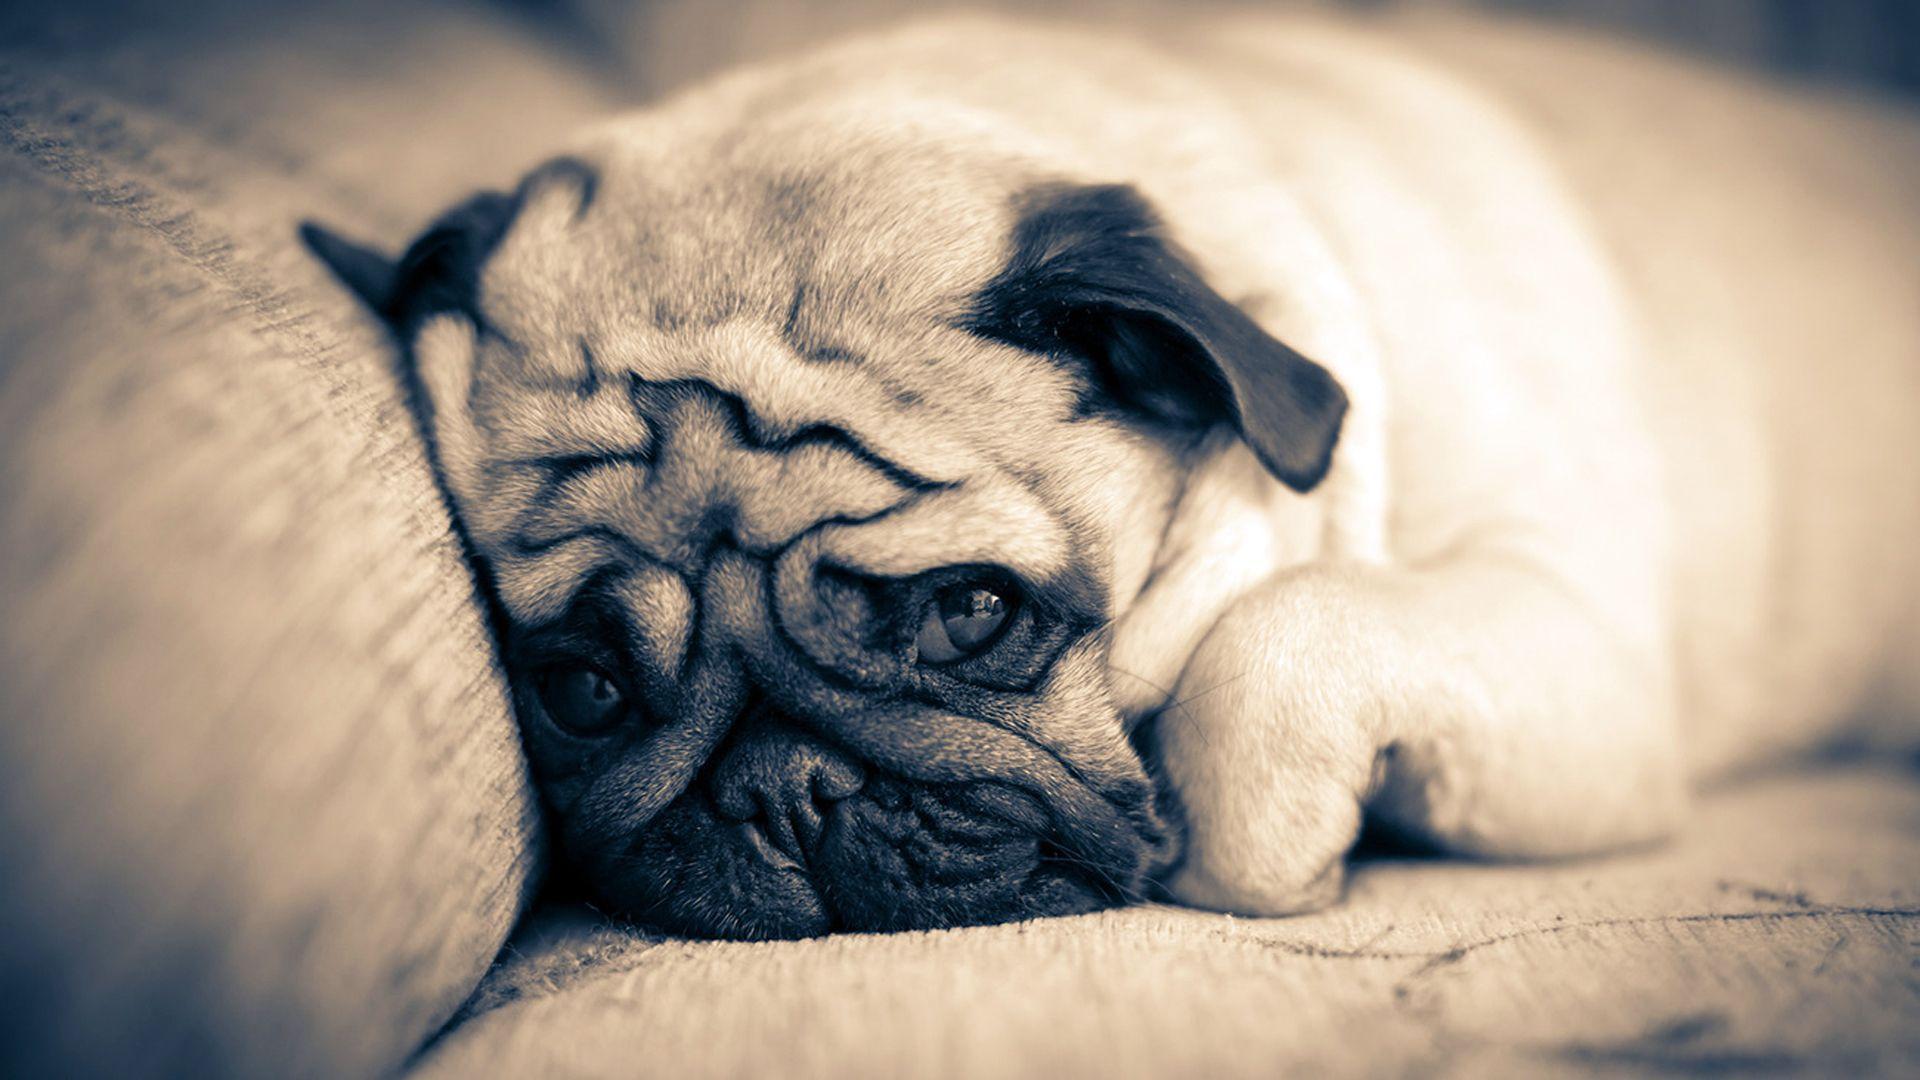 Cute Puppy Iphone Wallpaper Free Desktop Pug Wallpapers Pixelstalk Net